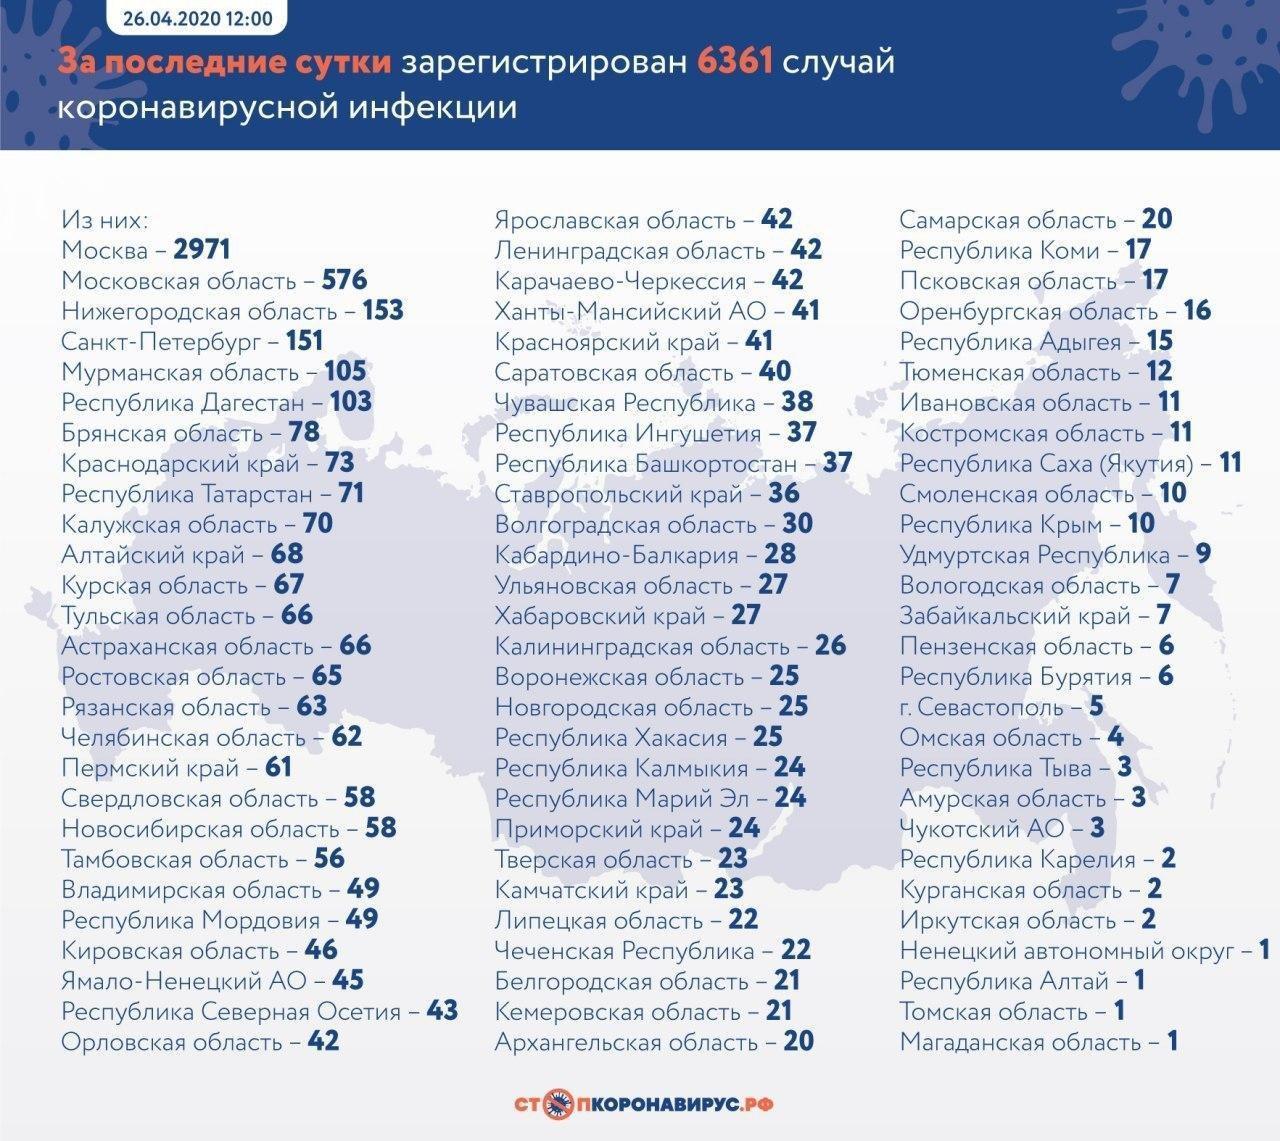 Данные © стопкоронавирус.рф